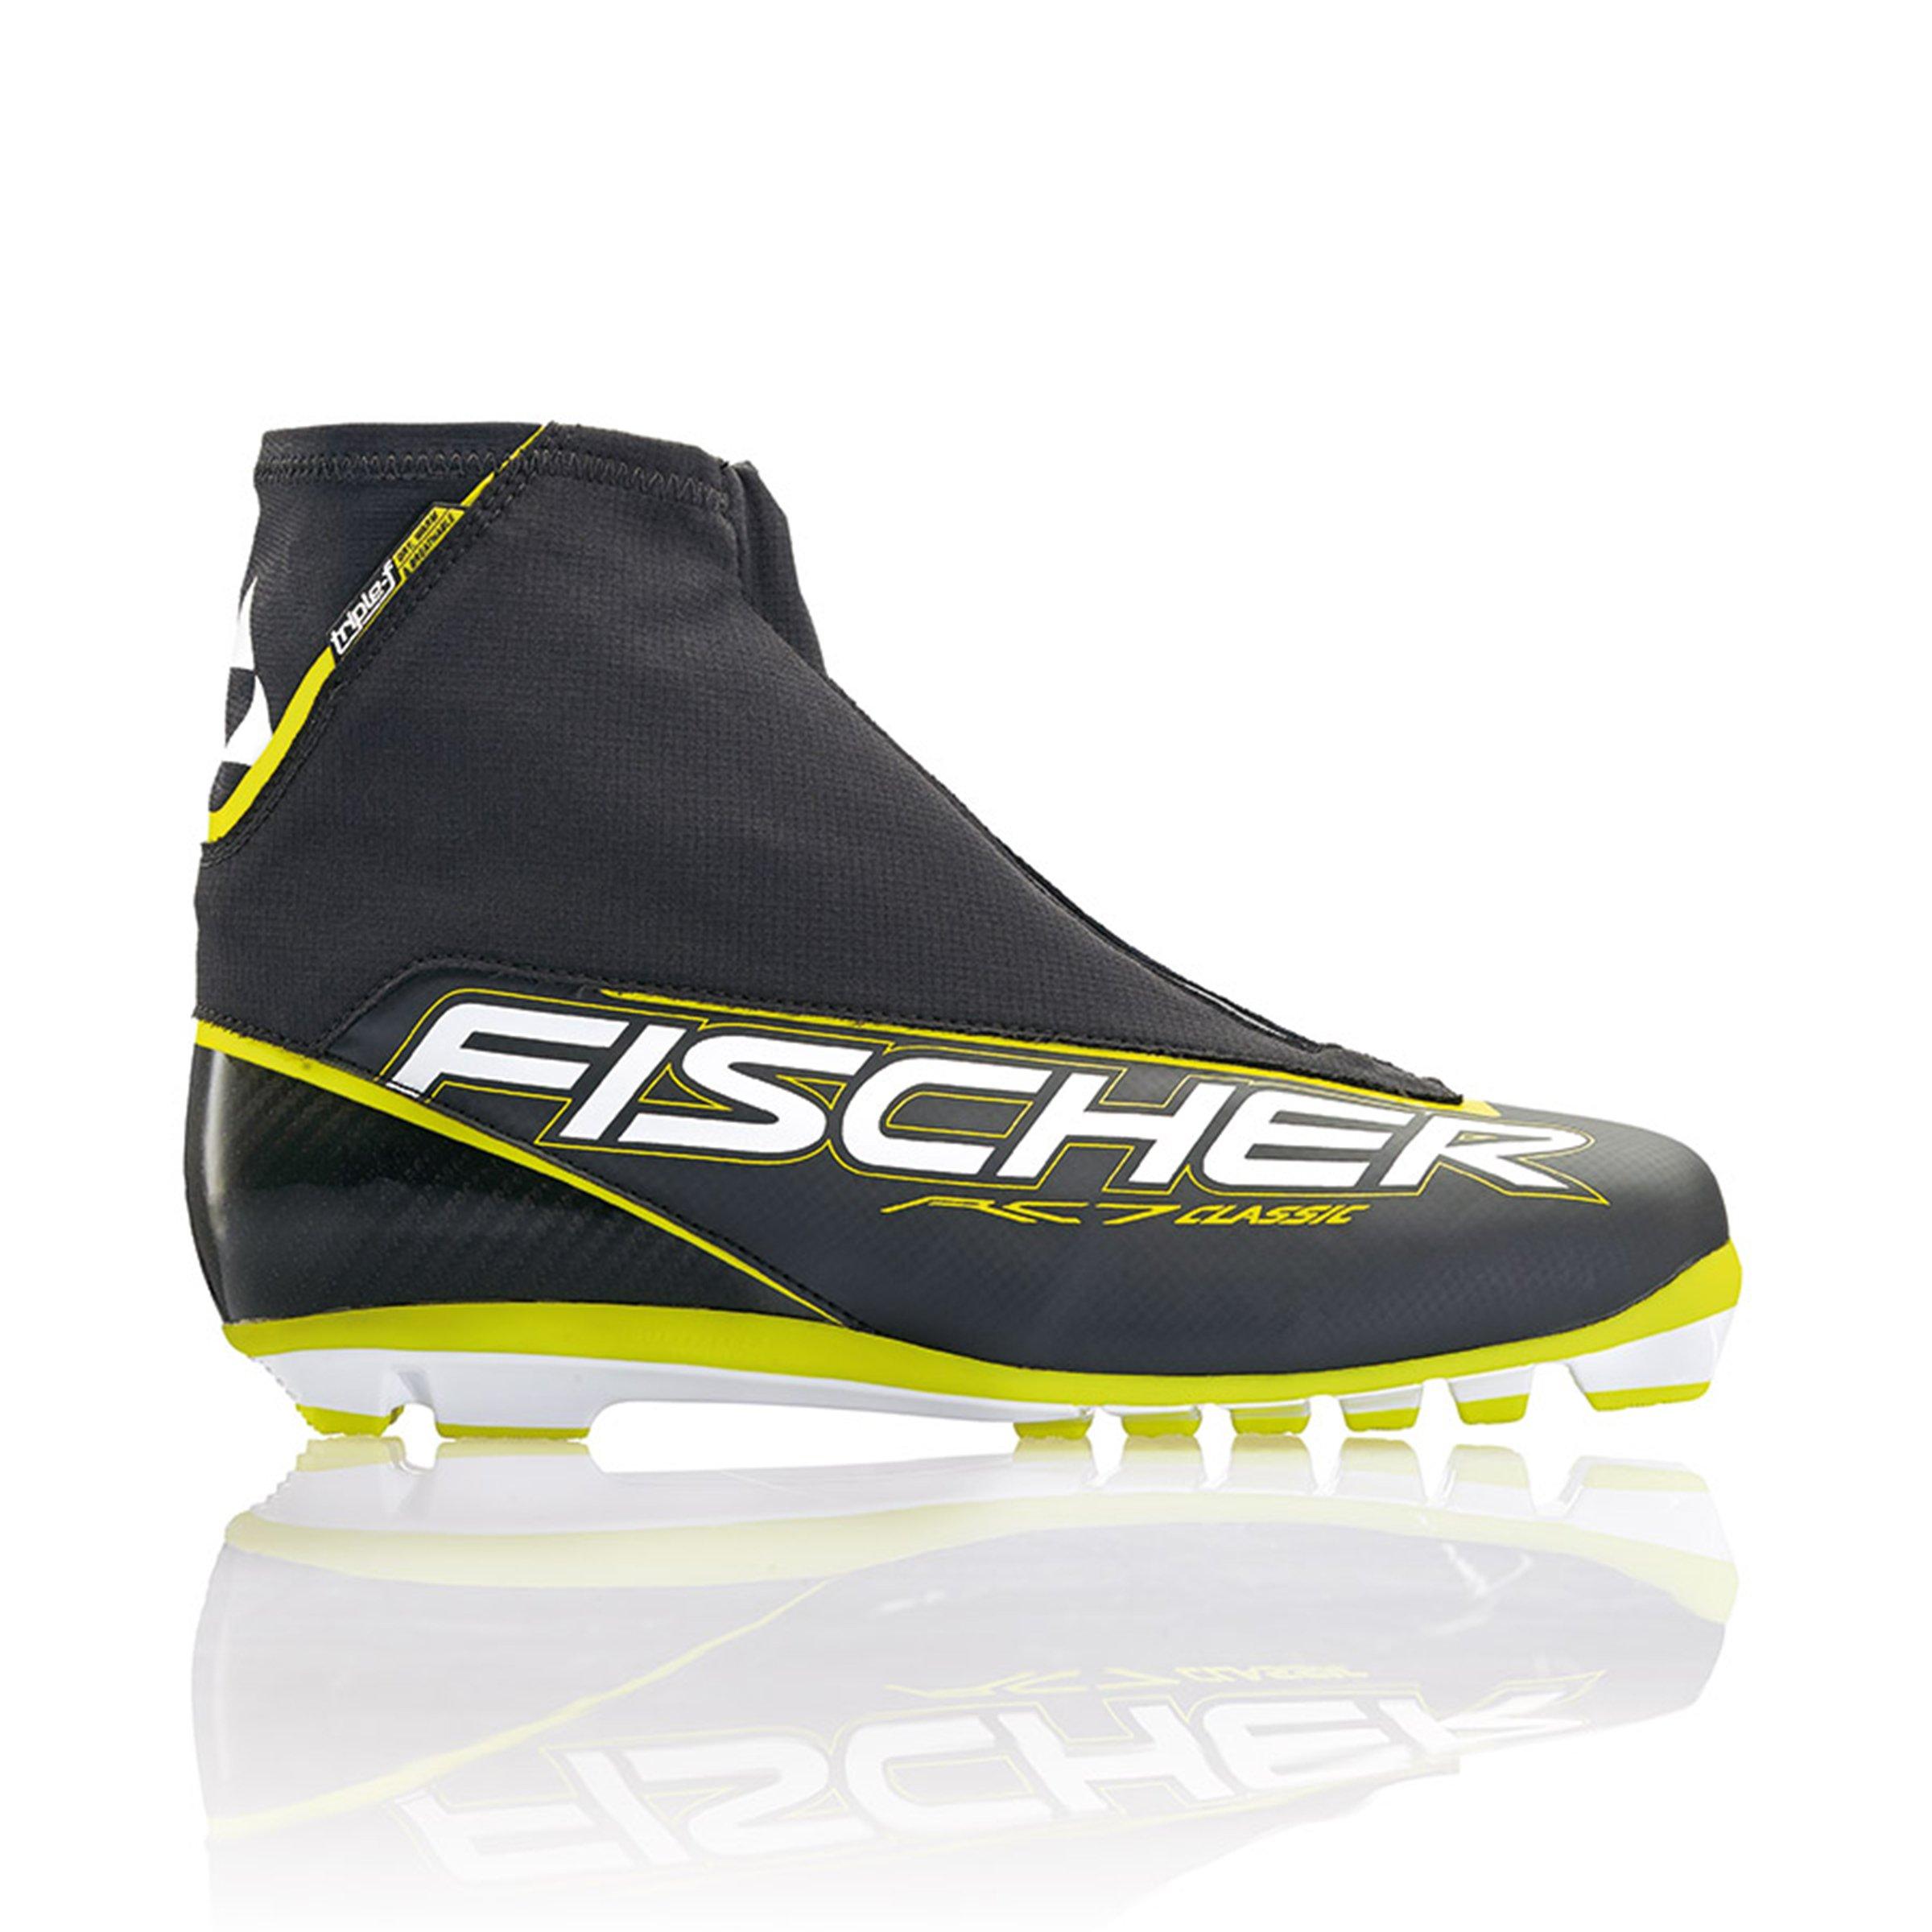 Fischer RC7 Classic 2016/17